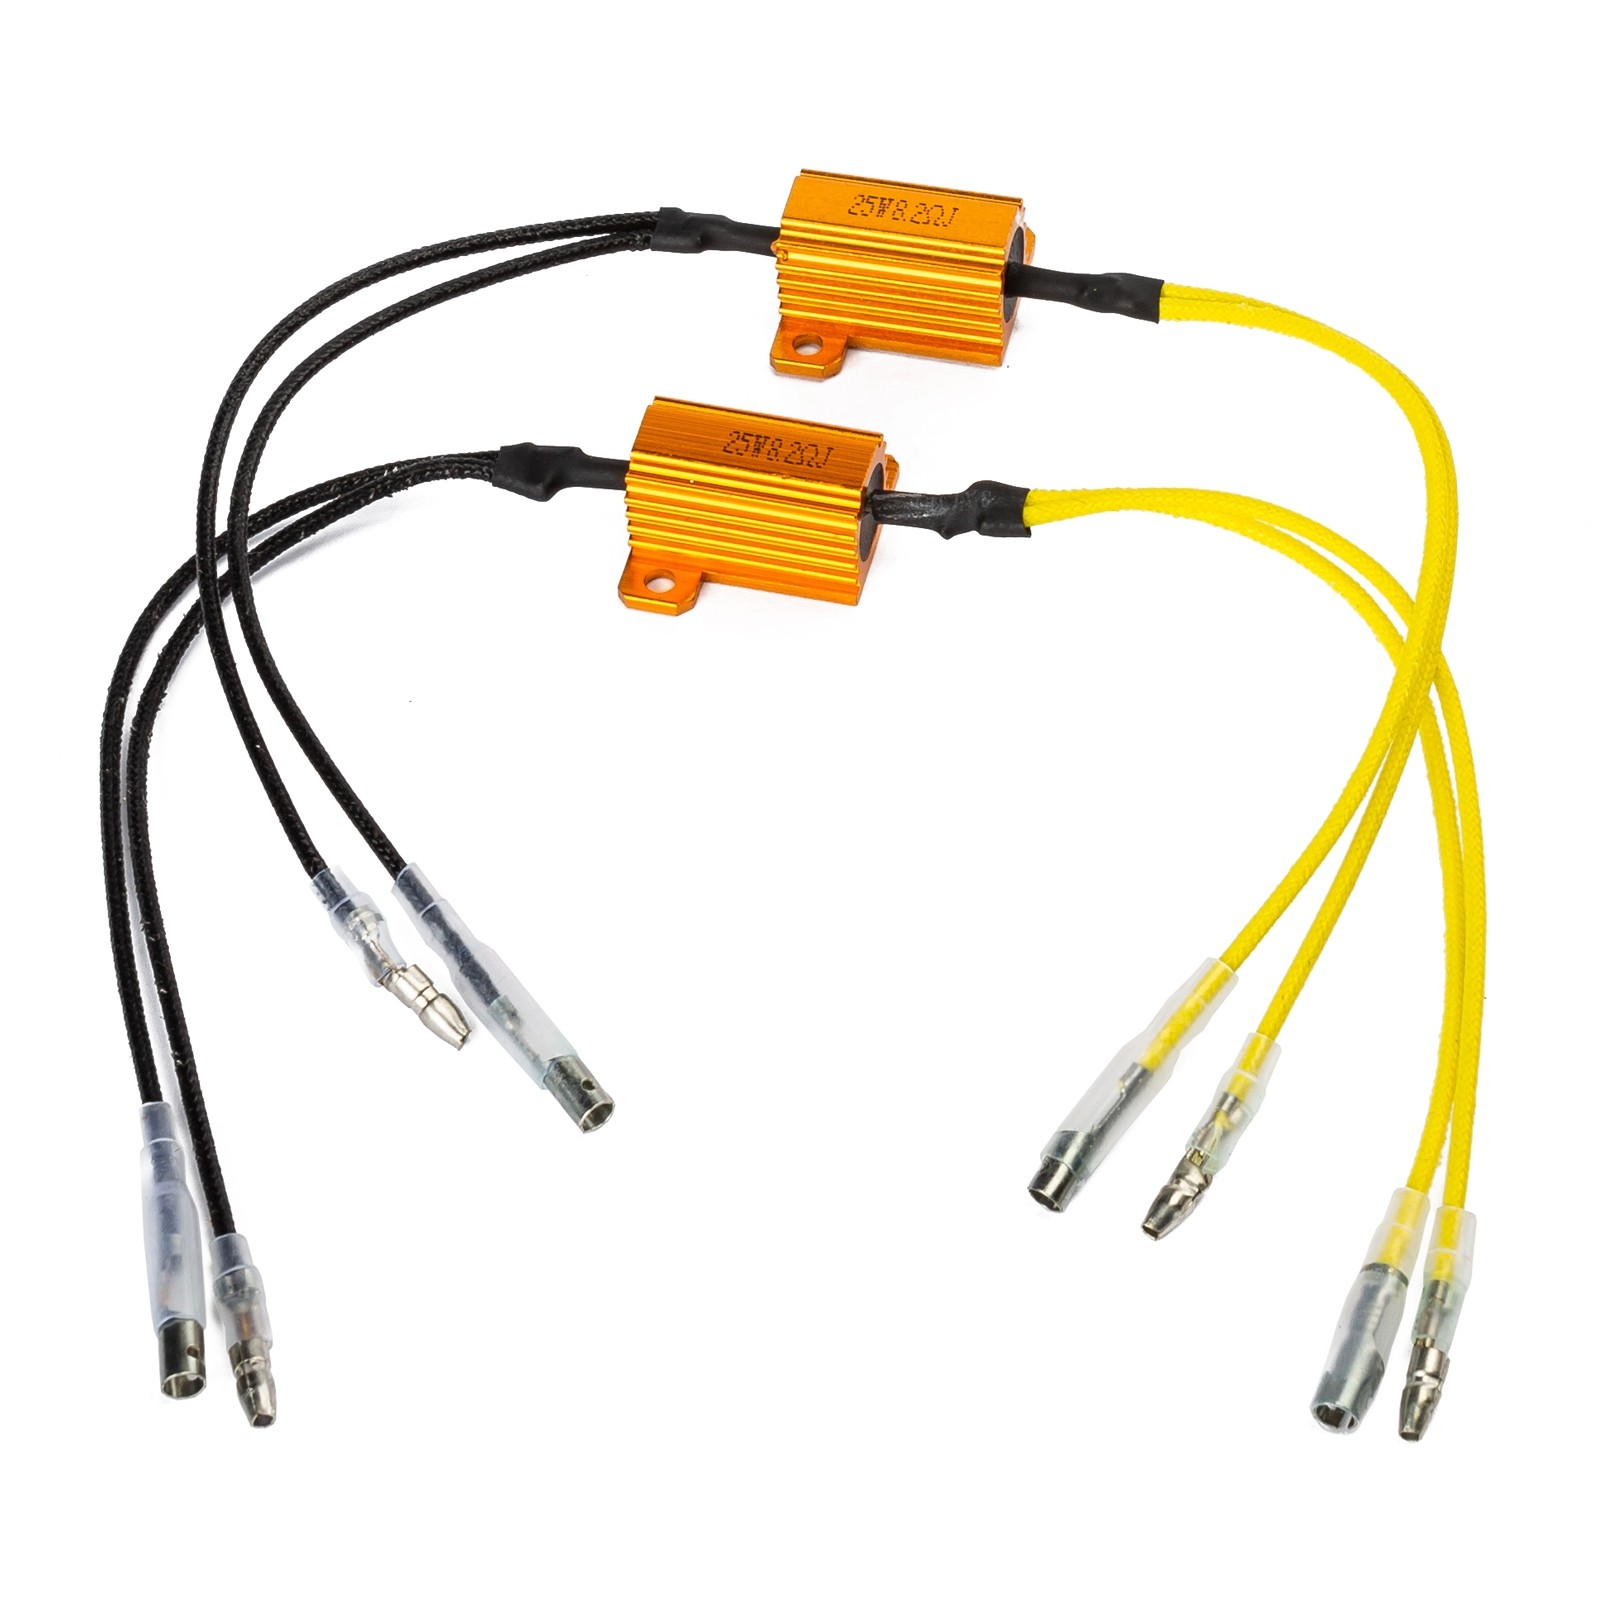 afrs10blac_resistenza_resistors_10W_a-pro